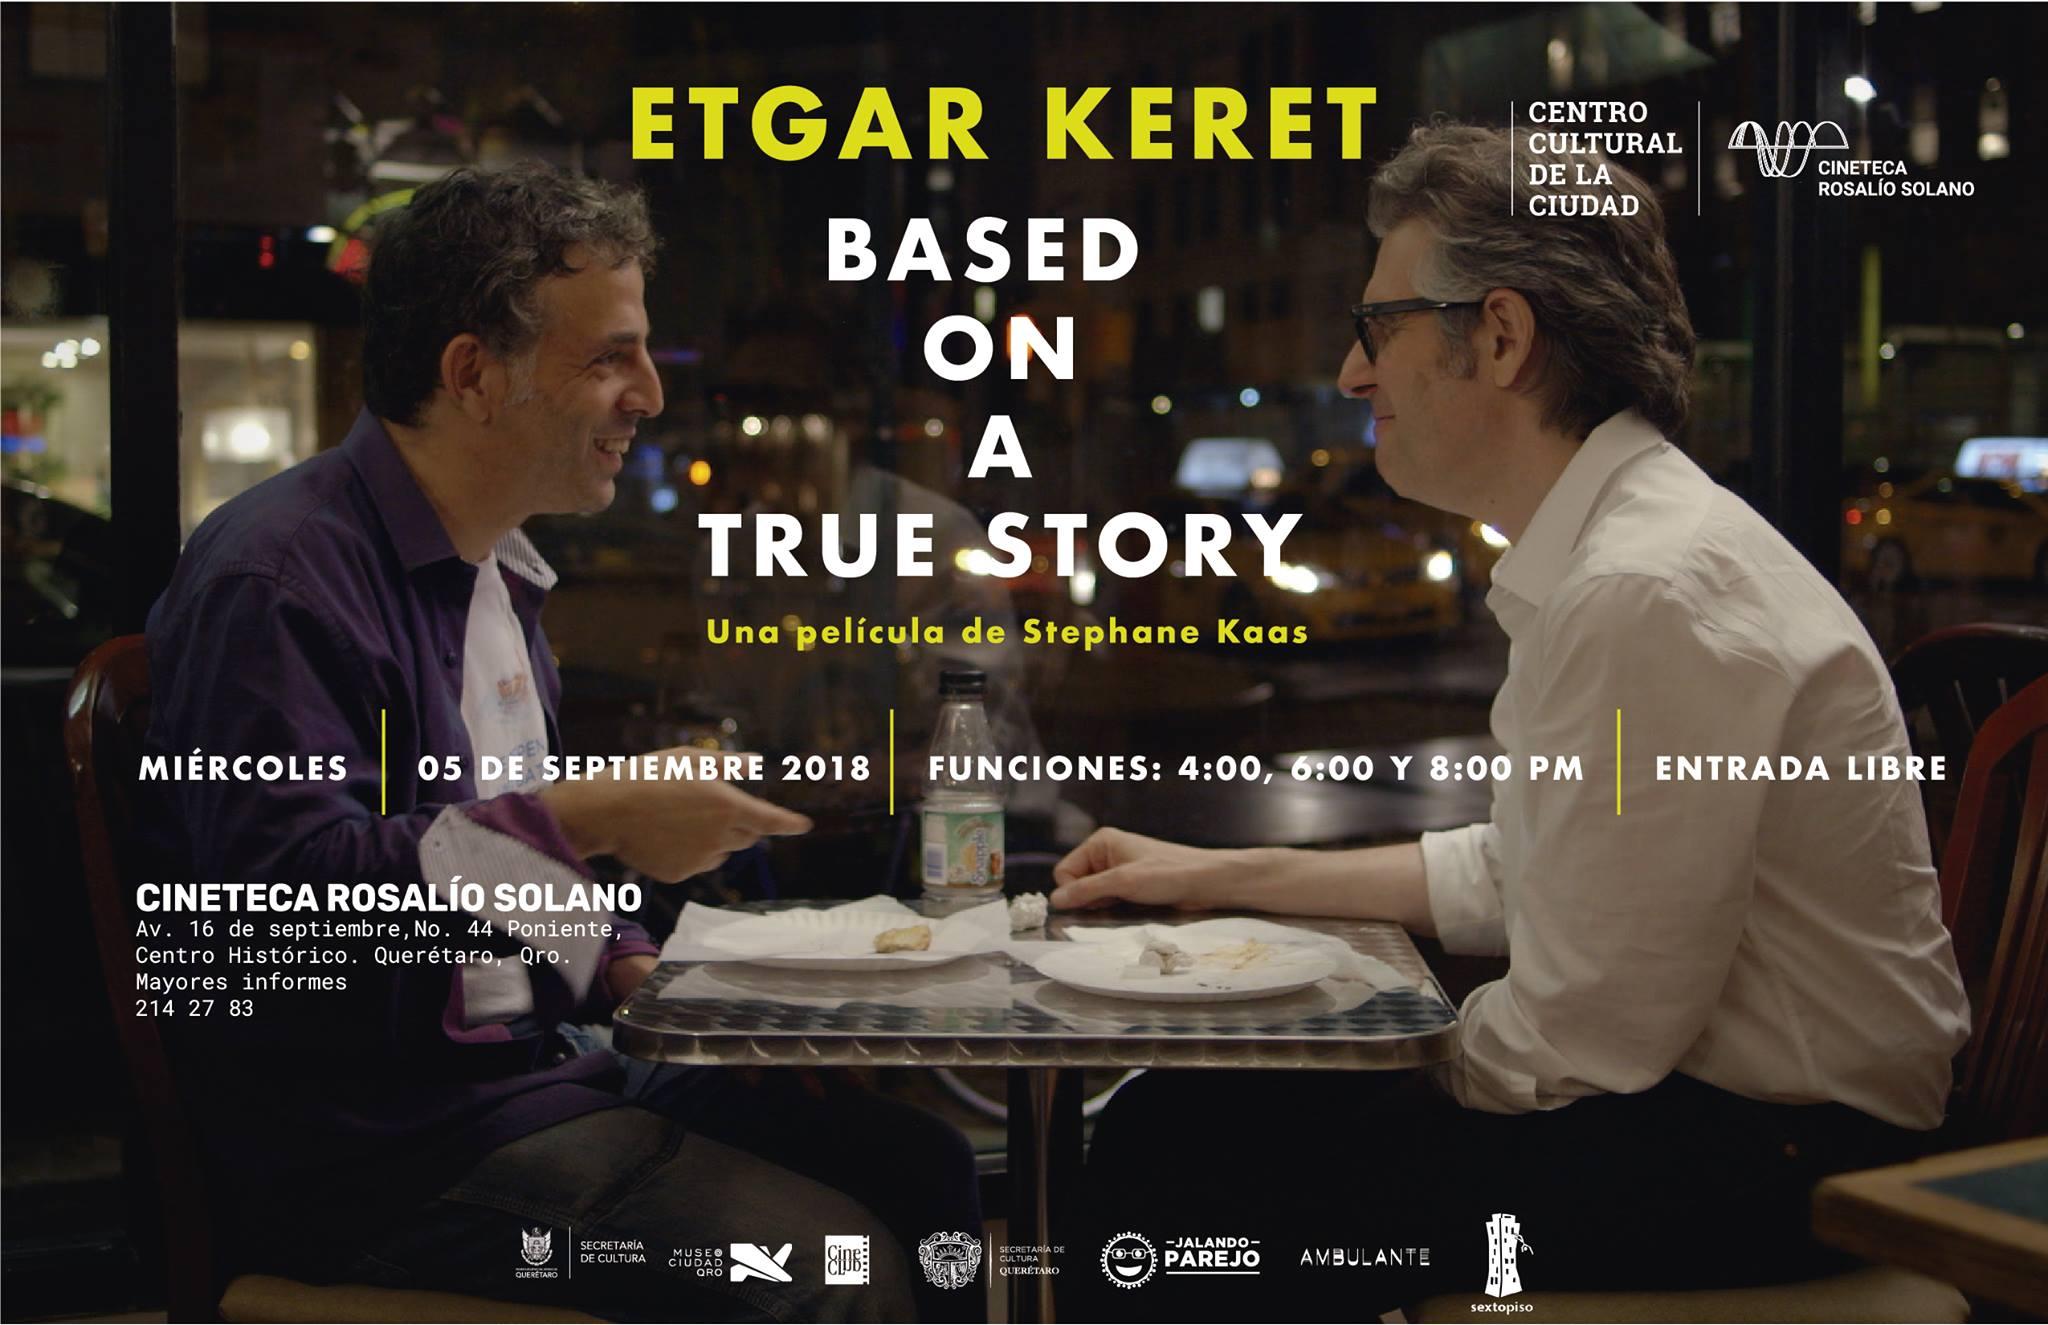 TGAR KERET: BASED ON A TRUE STORY | Querétaro Mio